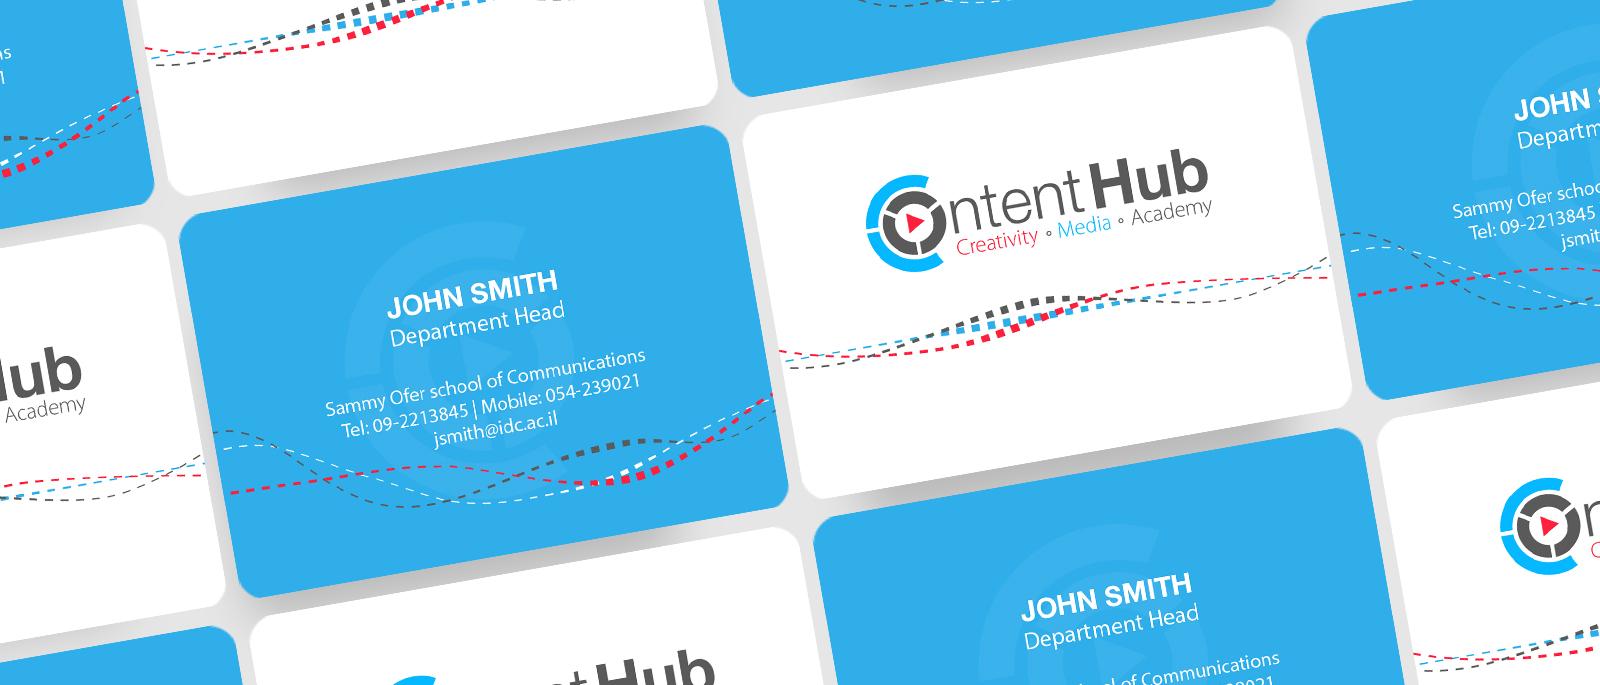 Branding content hub Herzeliya מיתוג וכרטיסי ביקור חממת התוכן הבינתחומי הרצליה